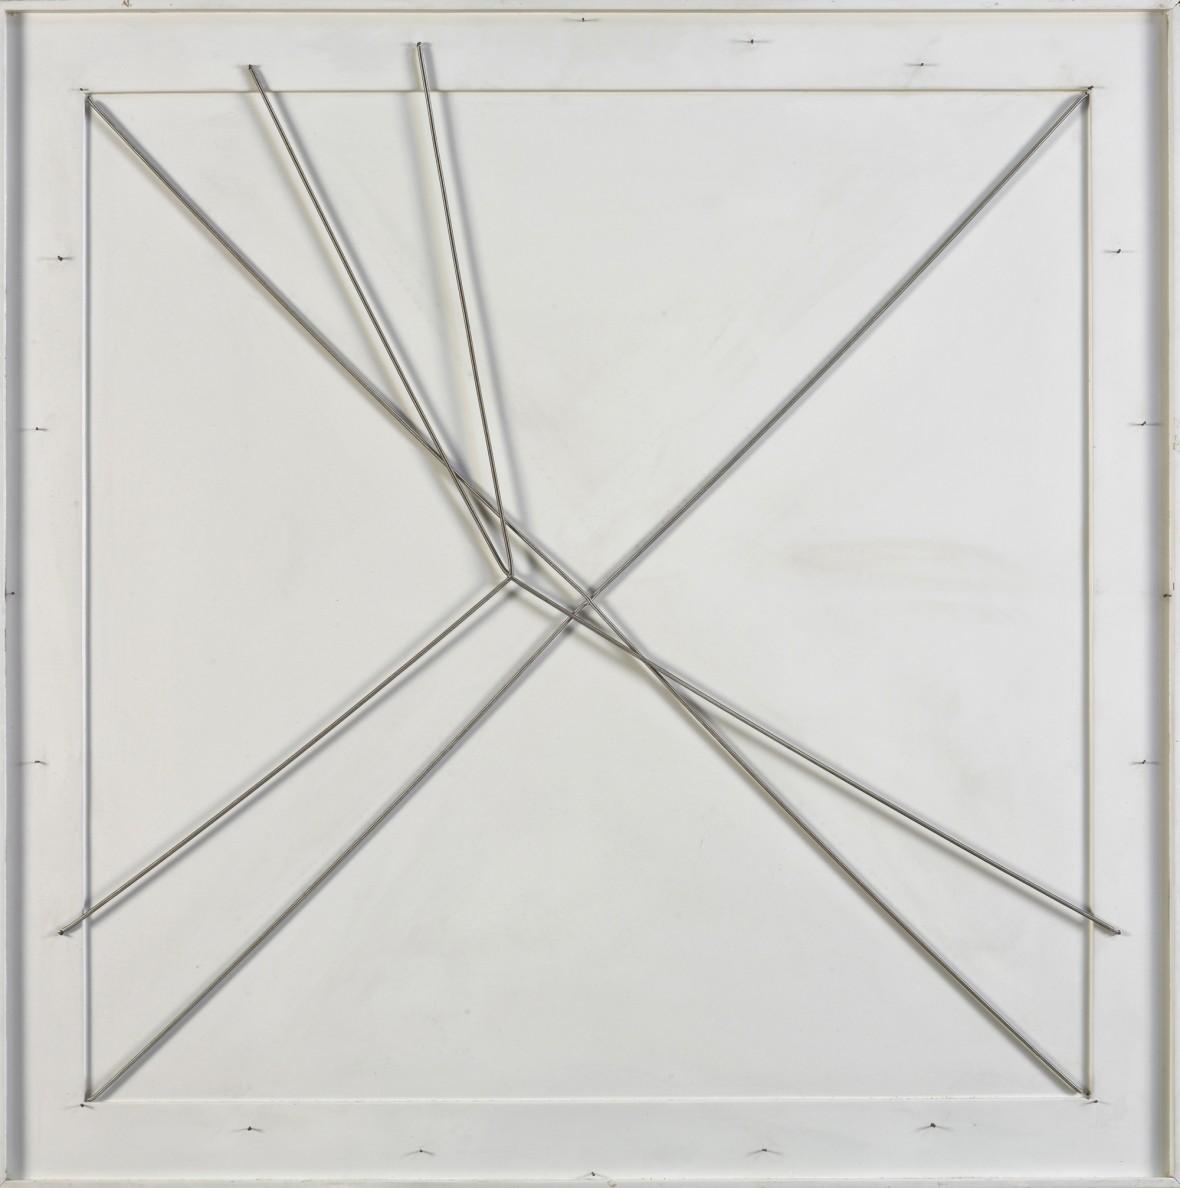 <p><b>Gianni Colombo,</b><i>Spazio elastico doppia X (Elastic Space Double X)</i>, 1982<br /> <br /><br /></p>